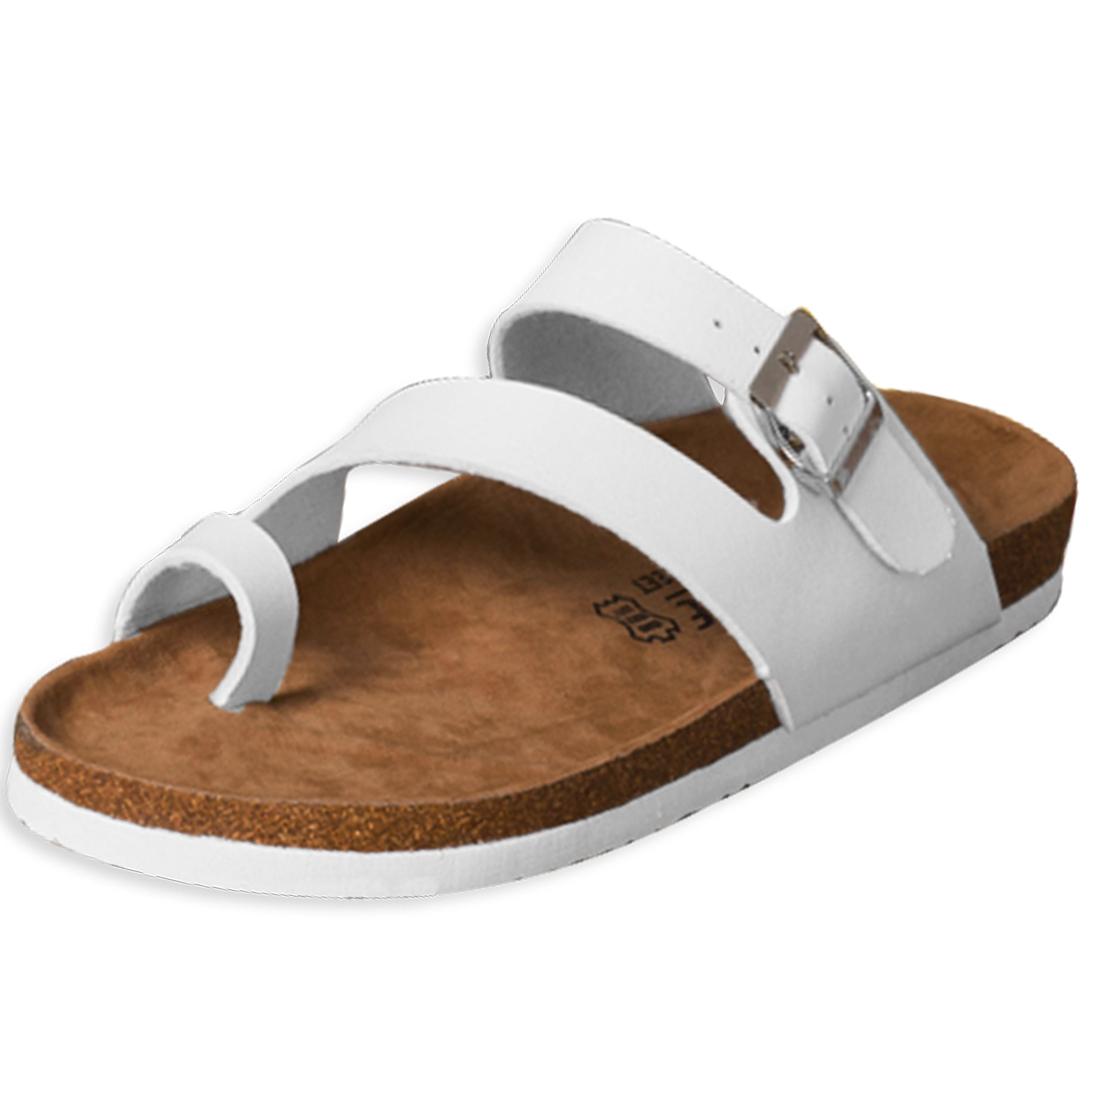 Summer Beach White Buckled Slide Unisex Sandals US 11